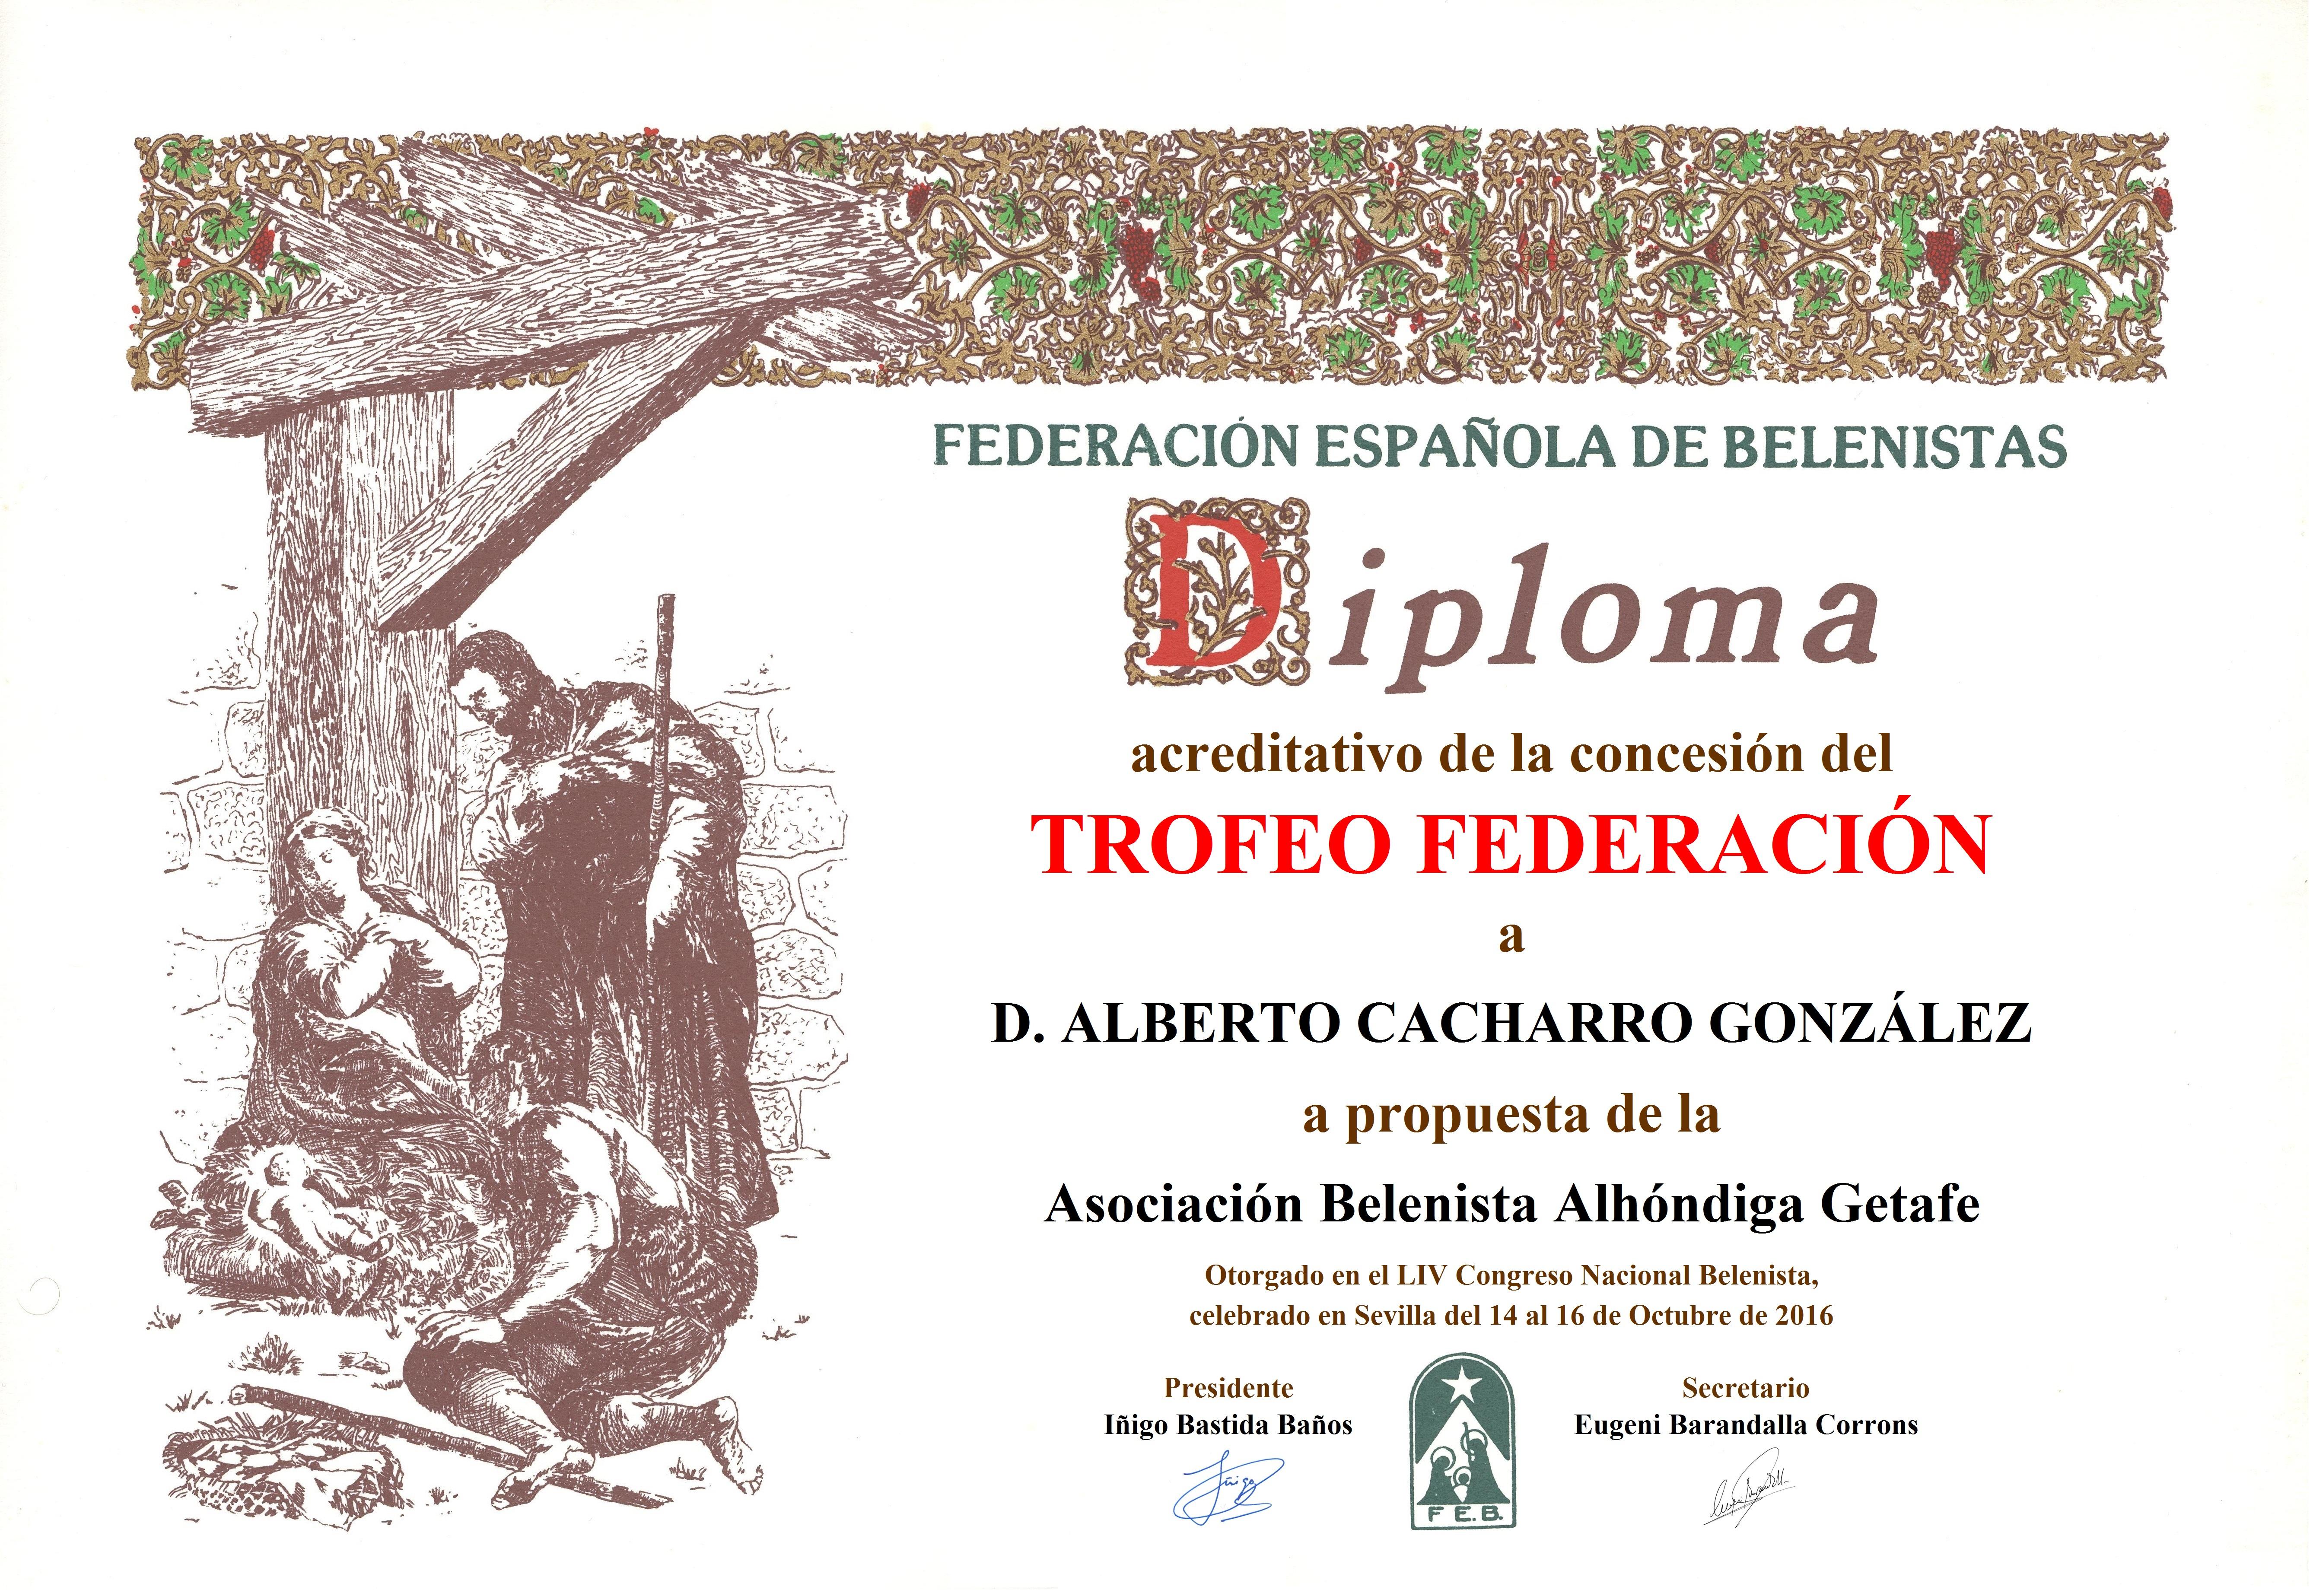 Diploma Trofeo FEB 2016 Alberto Cacharro González